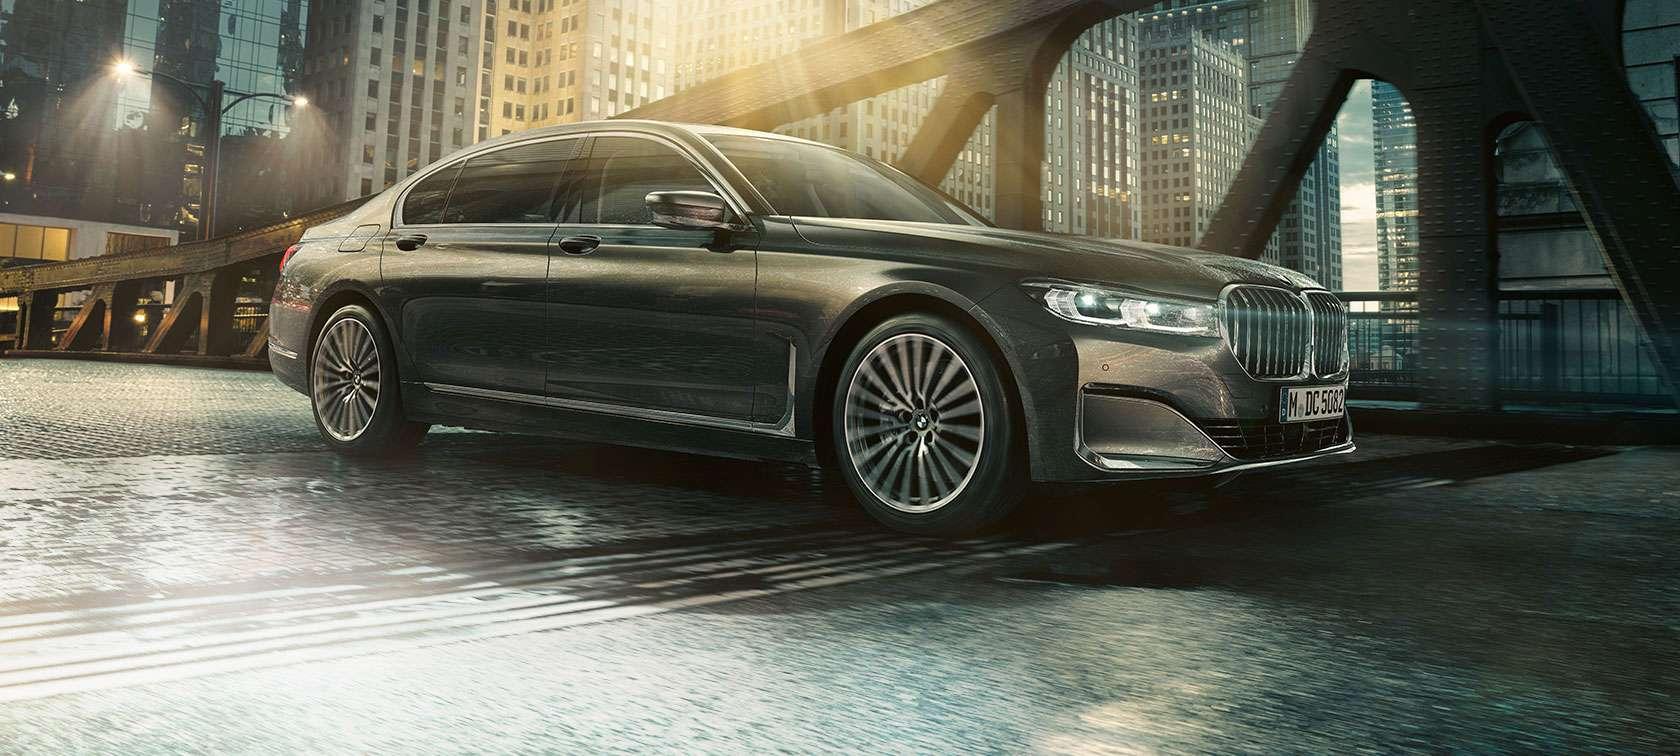 BMW Serie 7 motores diésel